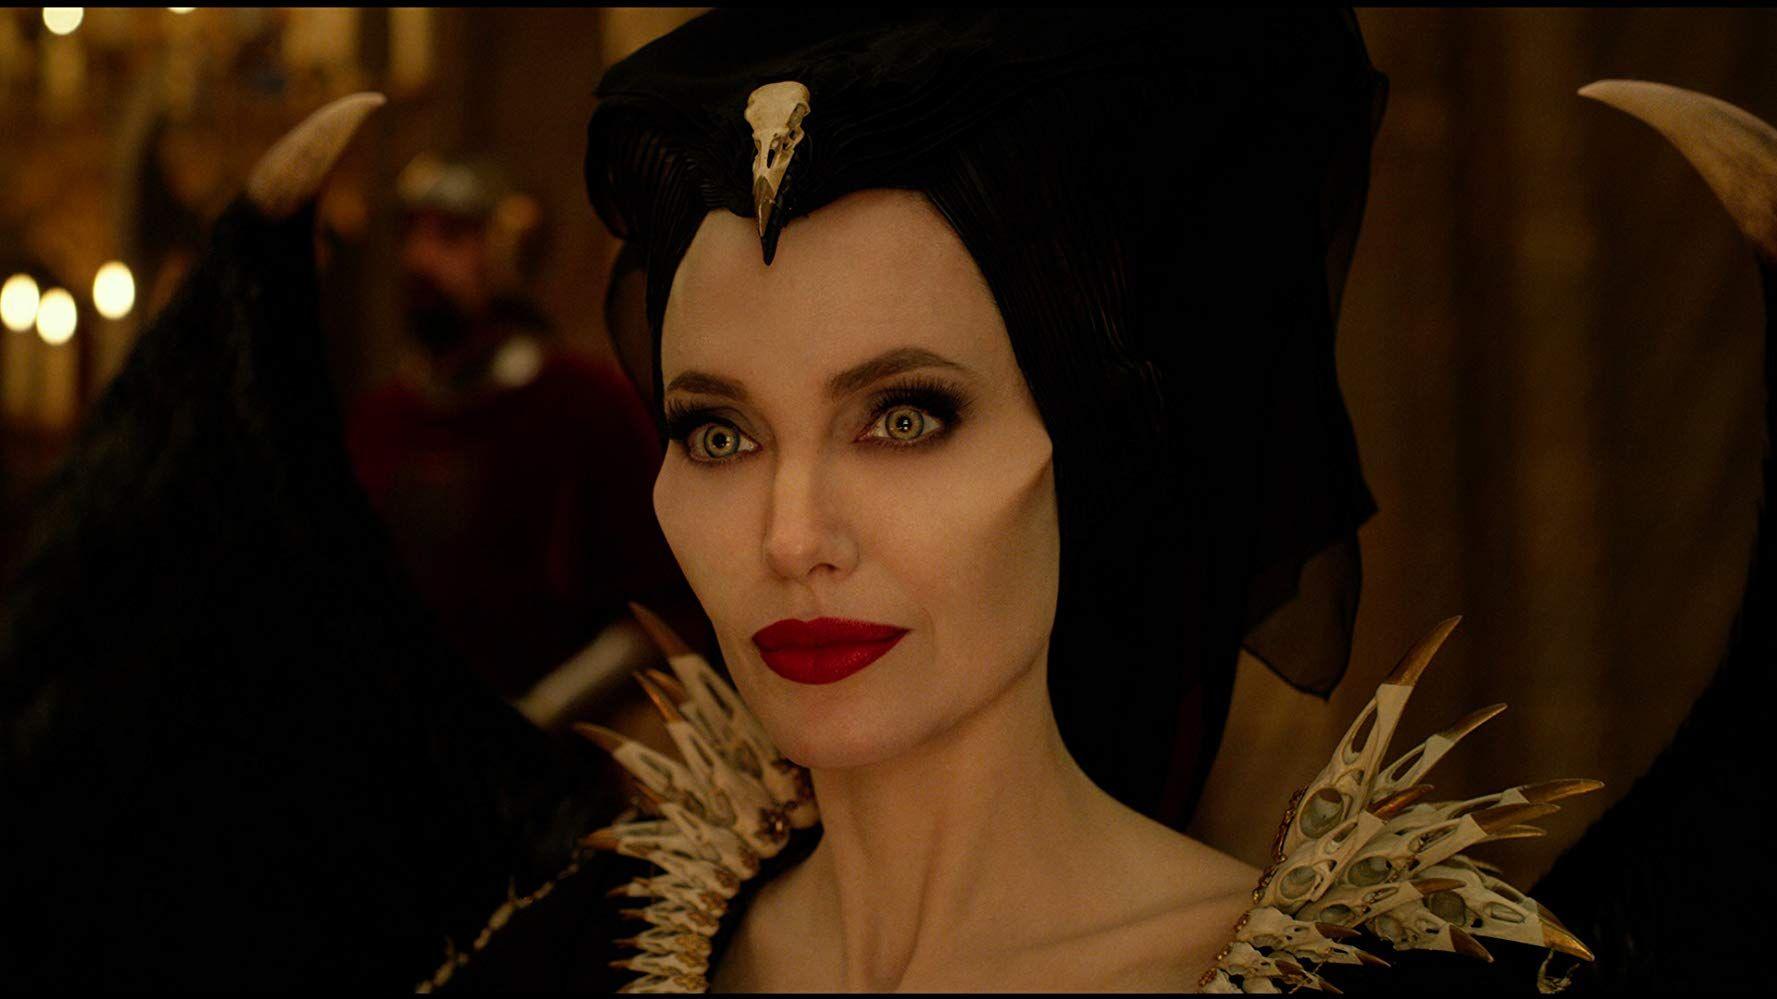 Maleficent 2 Defeats Joker With 36 Million Opening Weekend